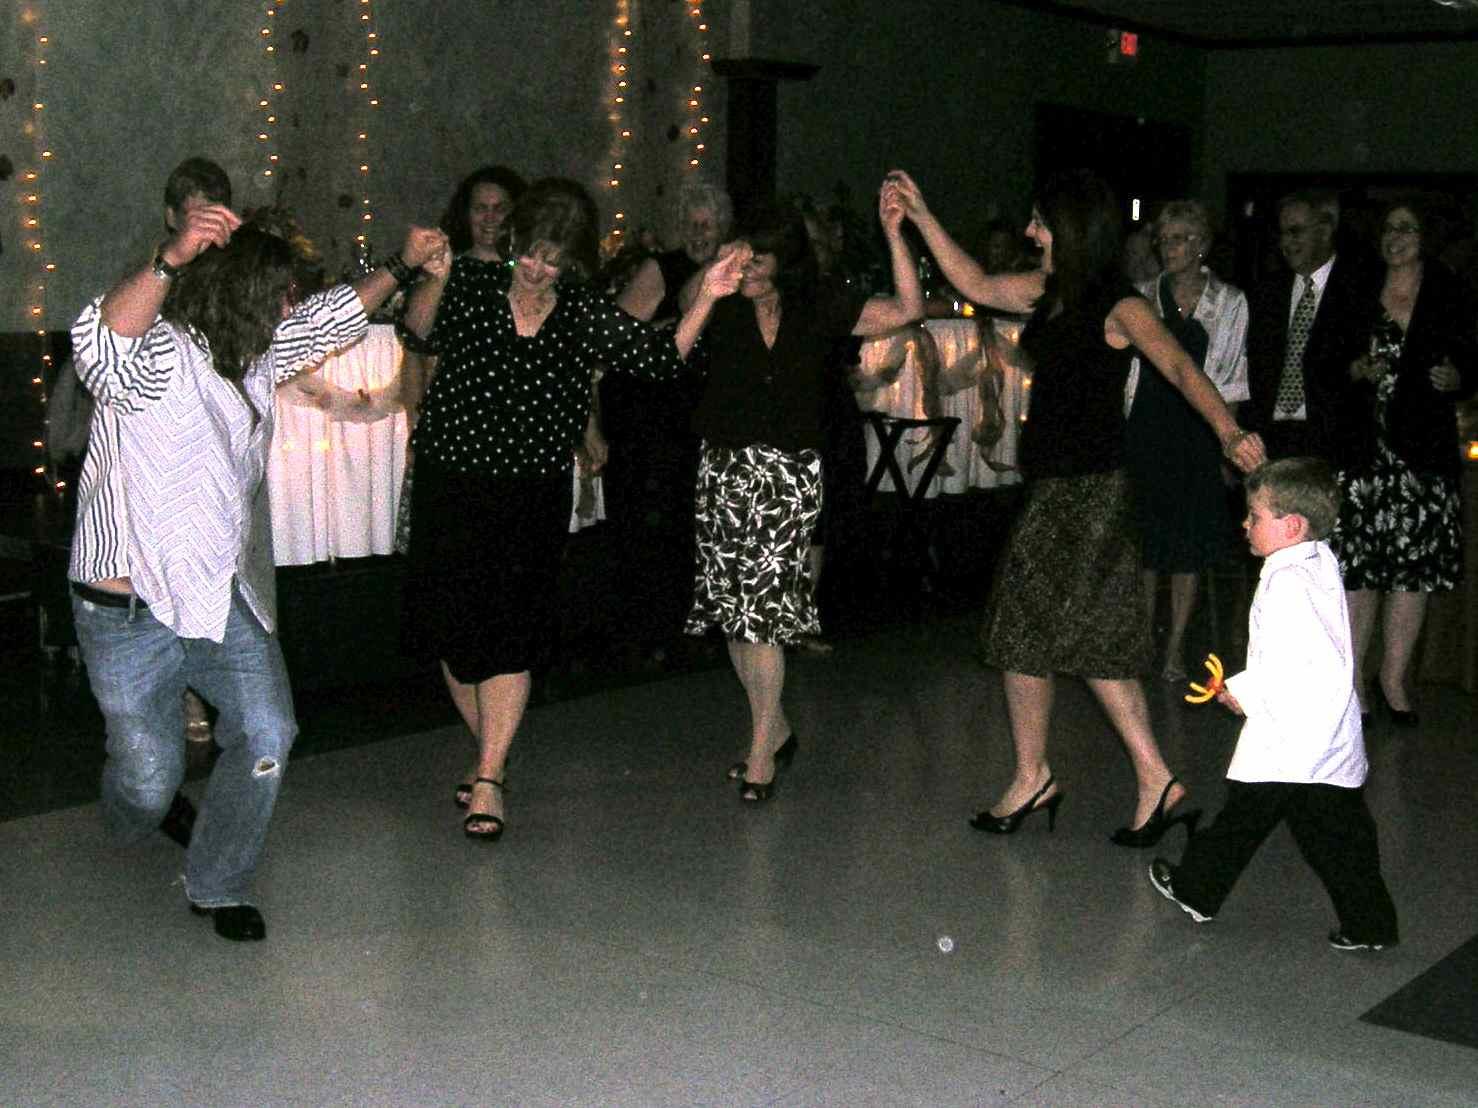 Wedding Entertainment 101